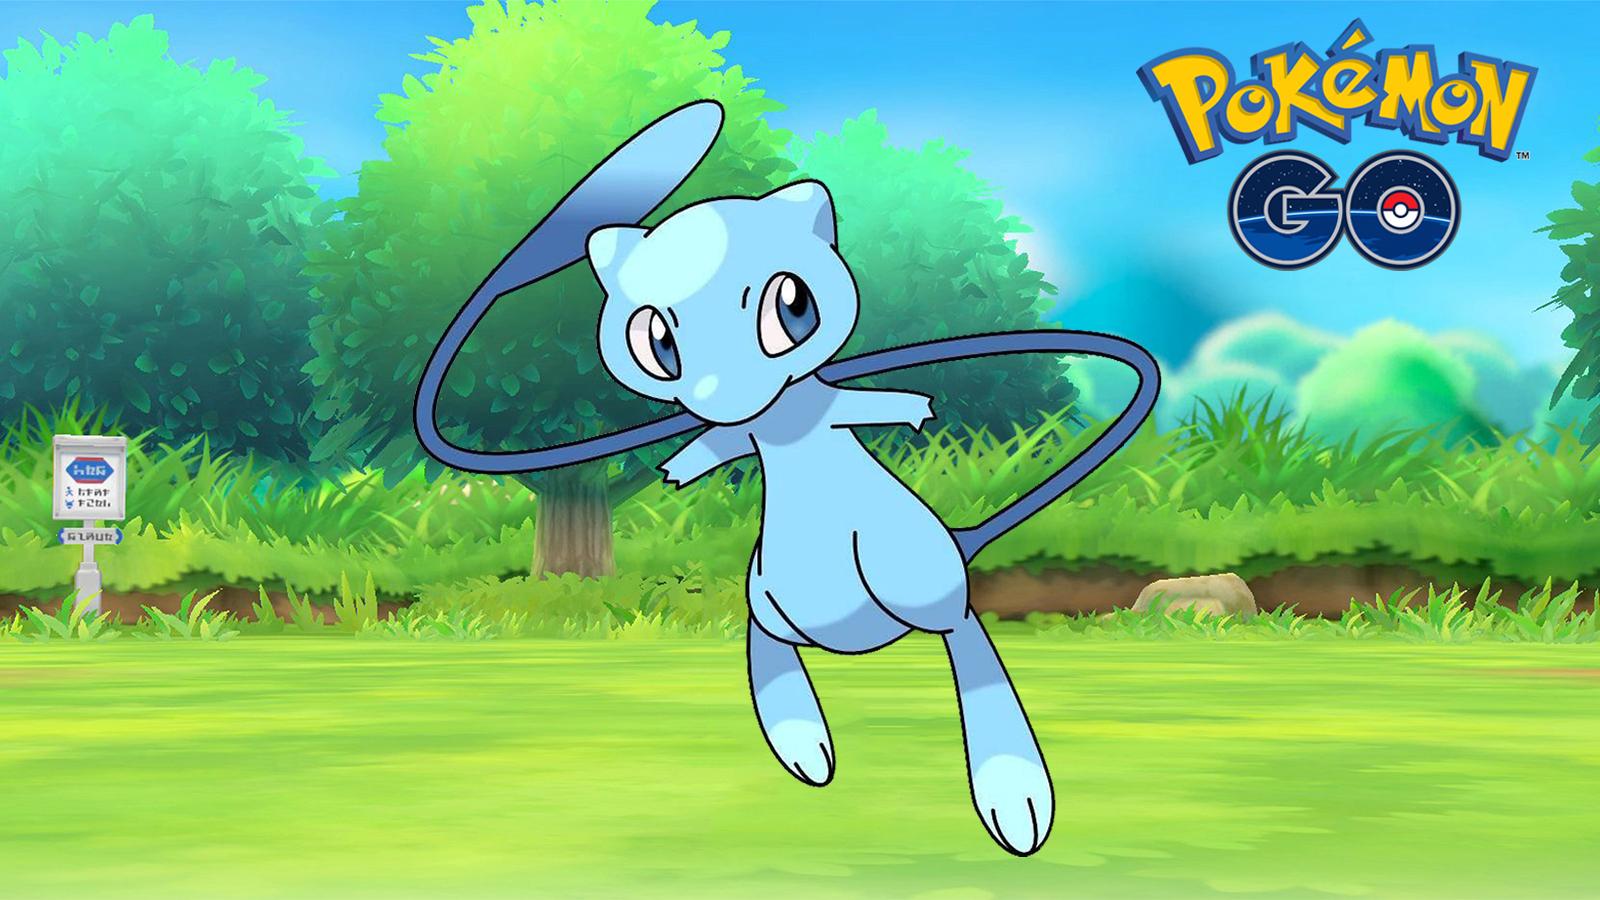 Shiny Mew in Pokemon GO